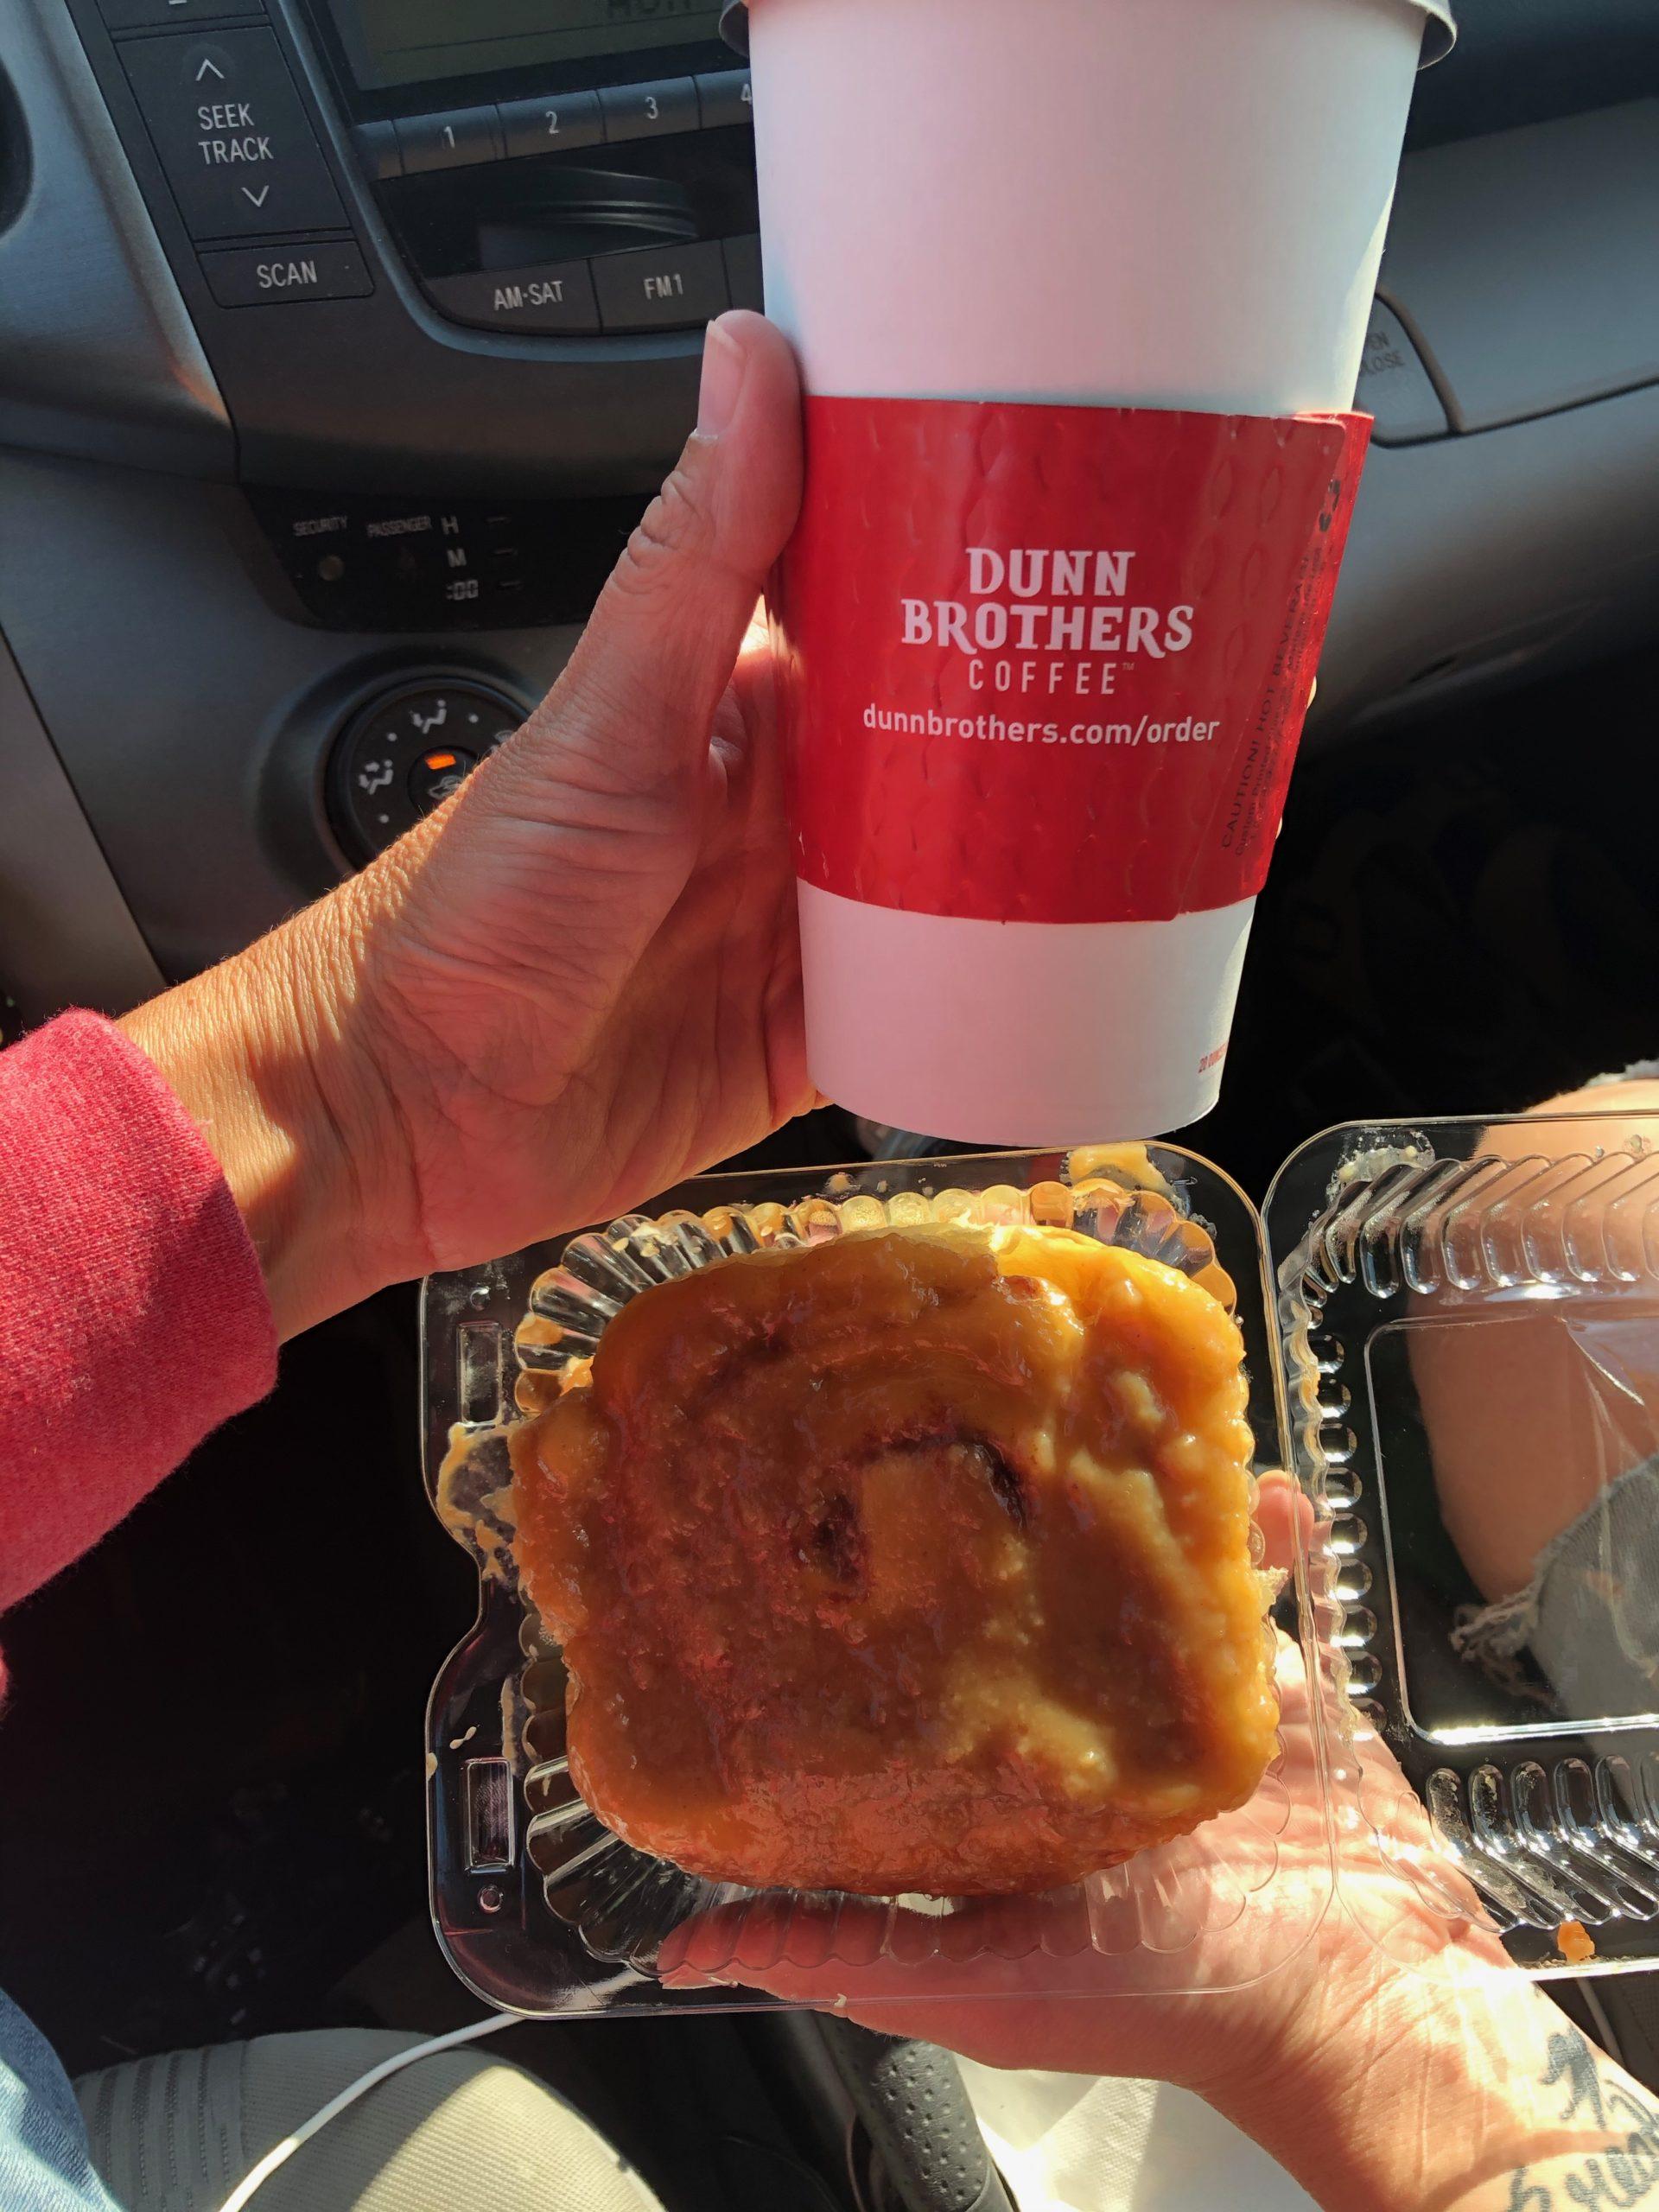 dunn bro coffee and caramel roll